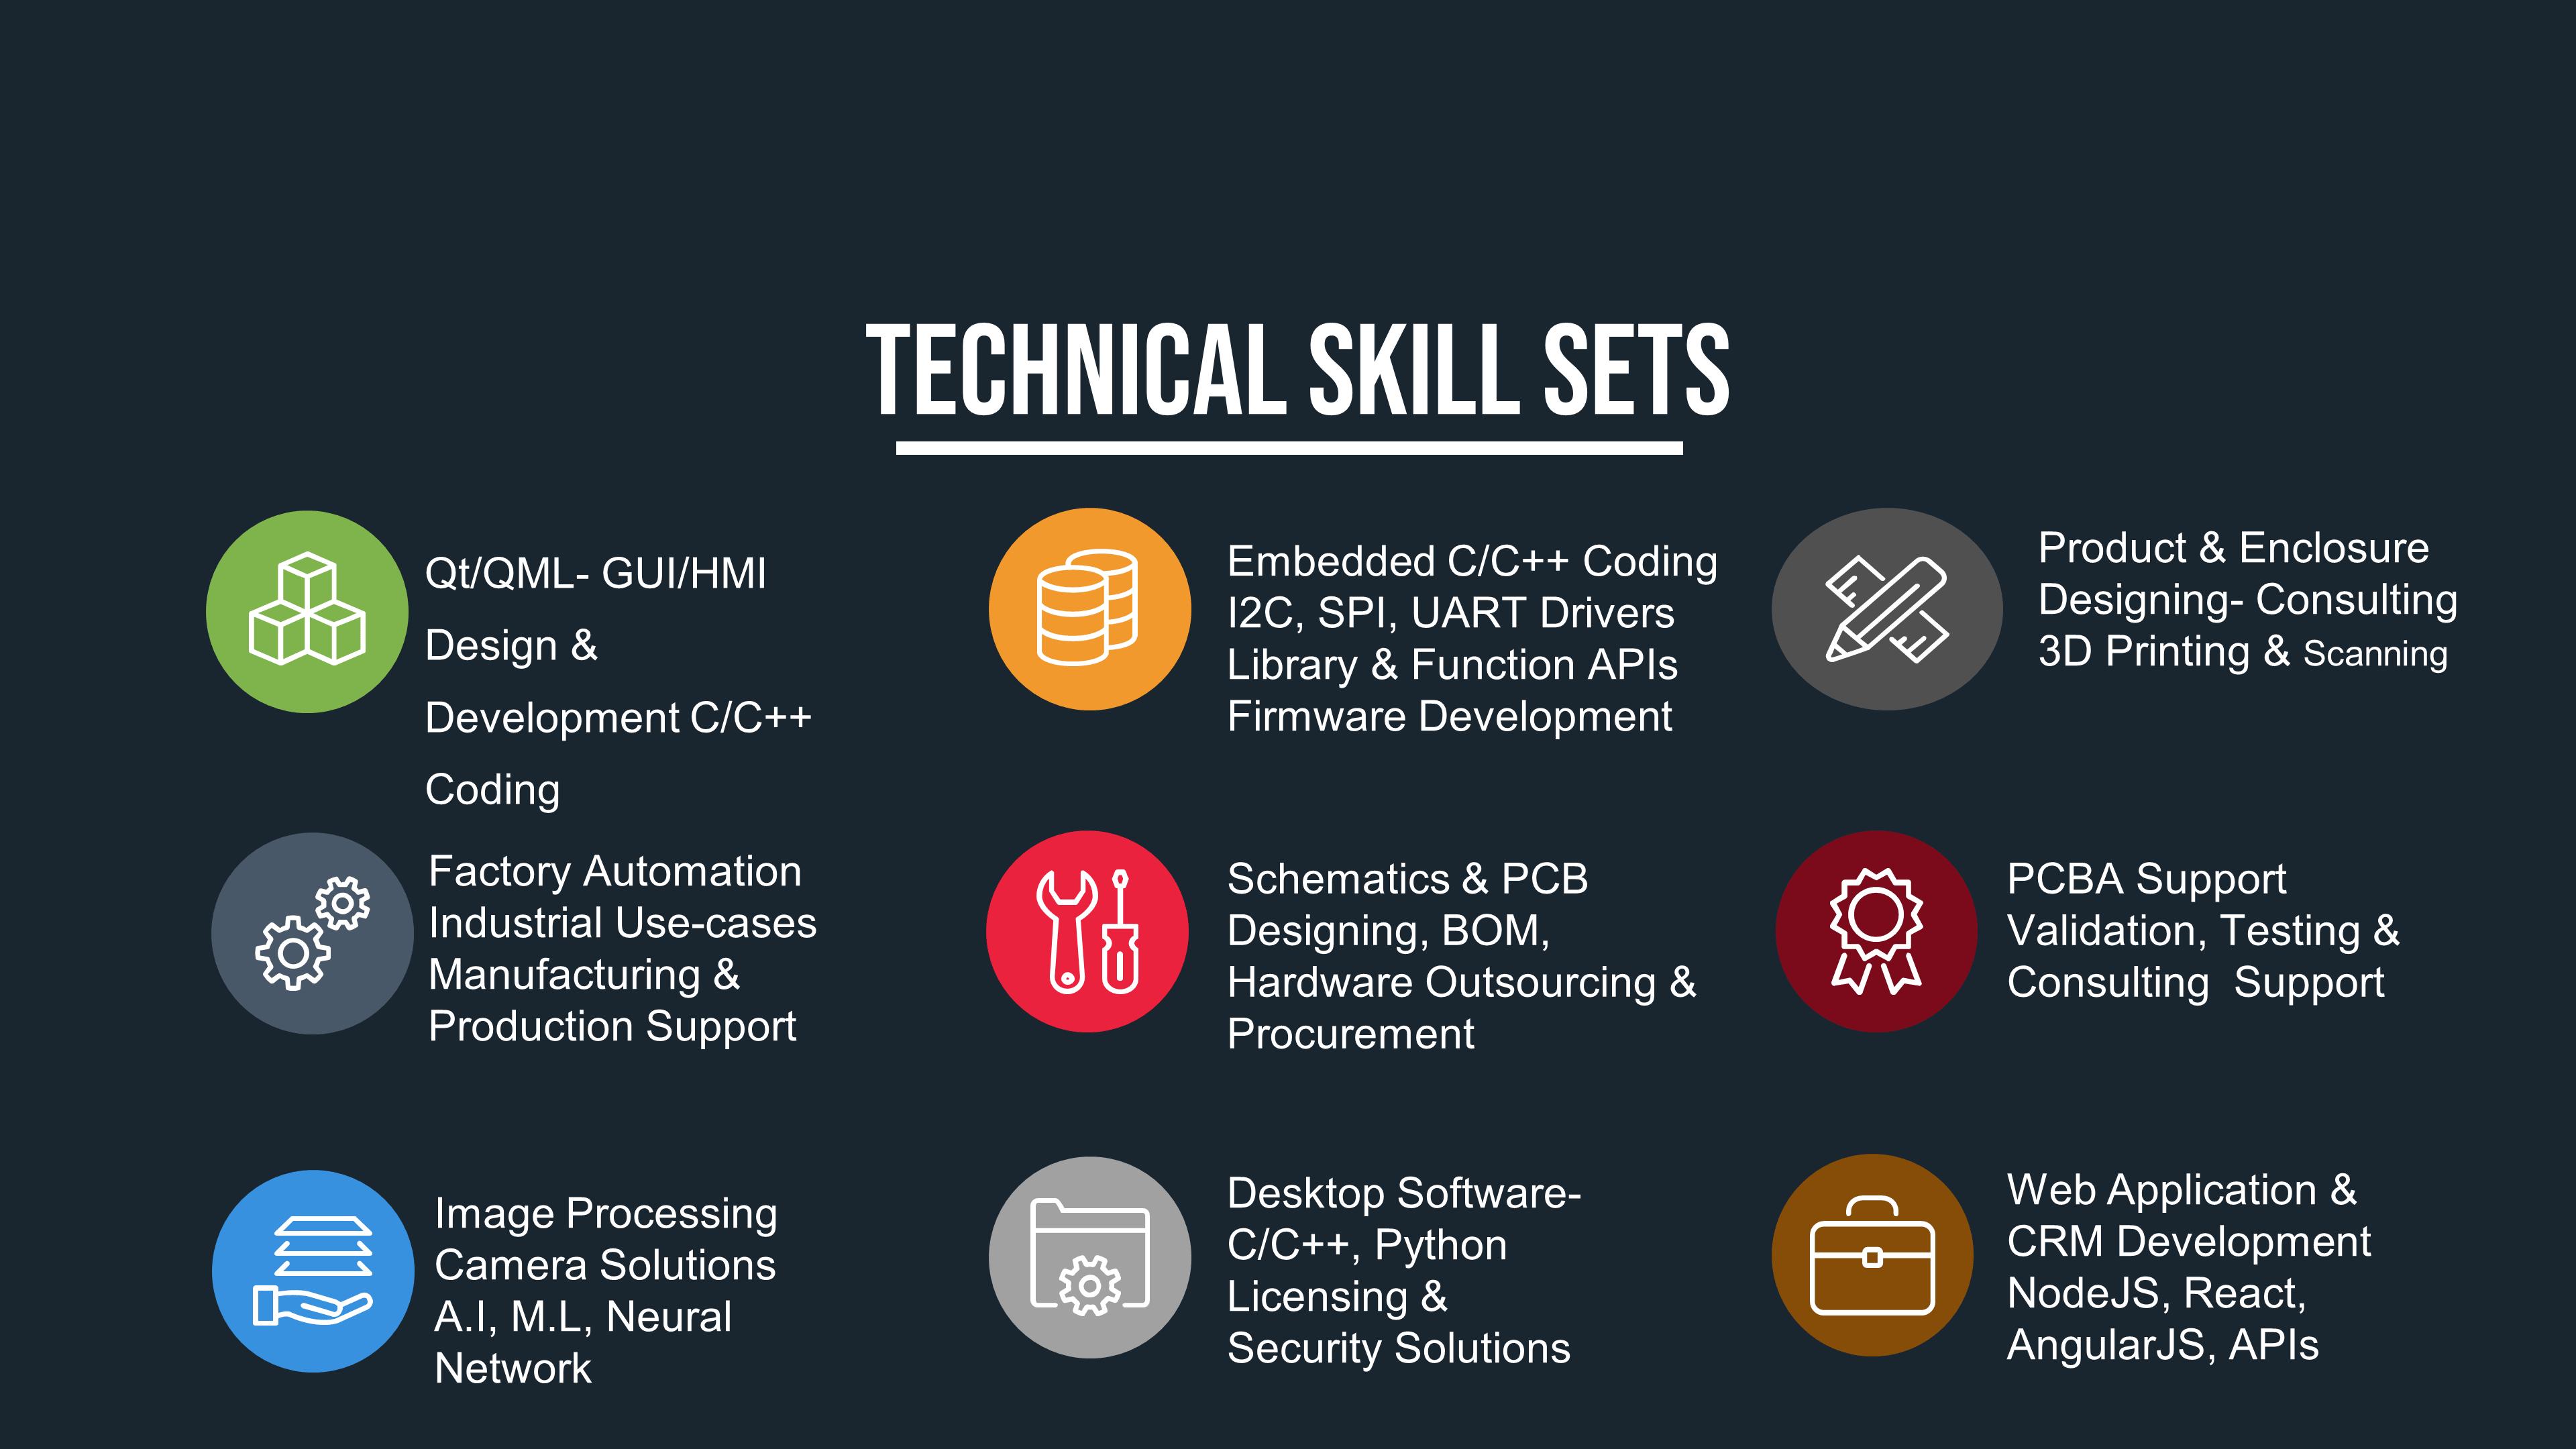 Our Skillset